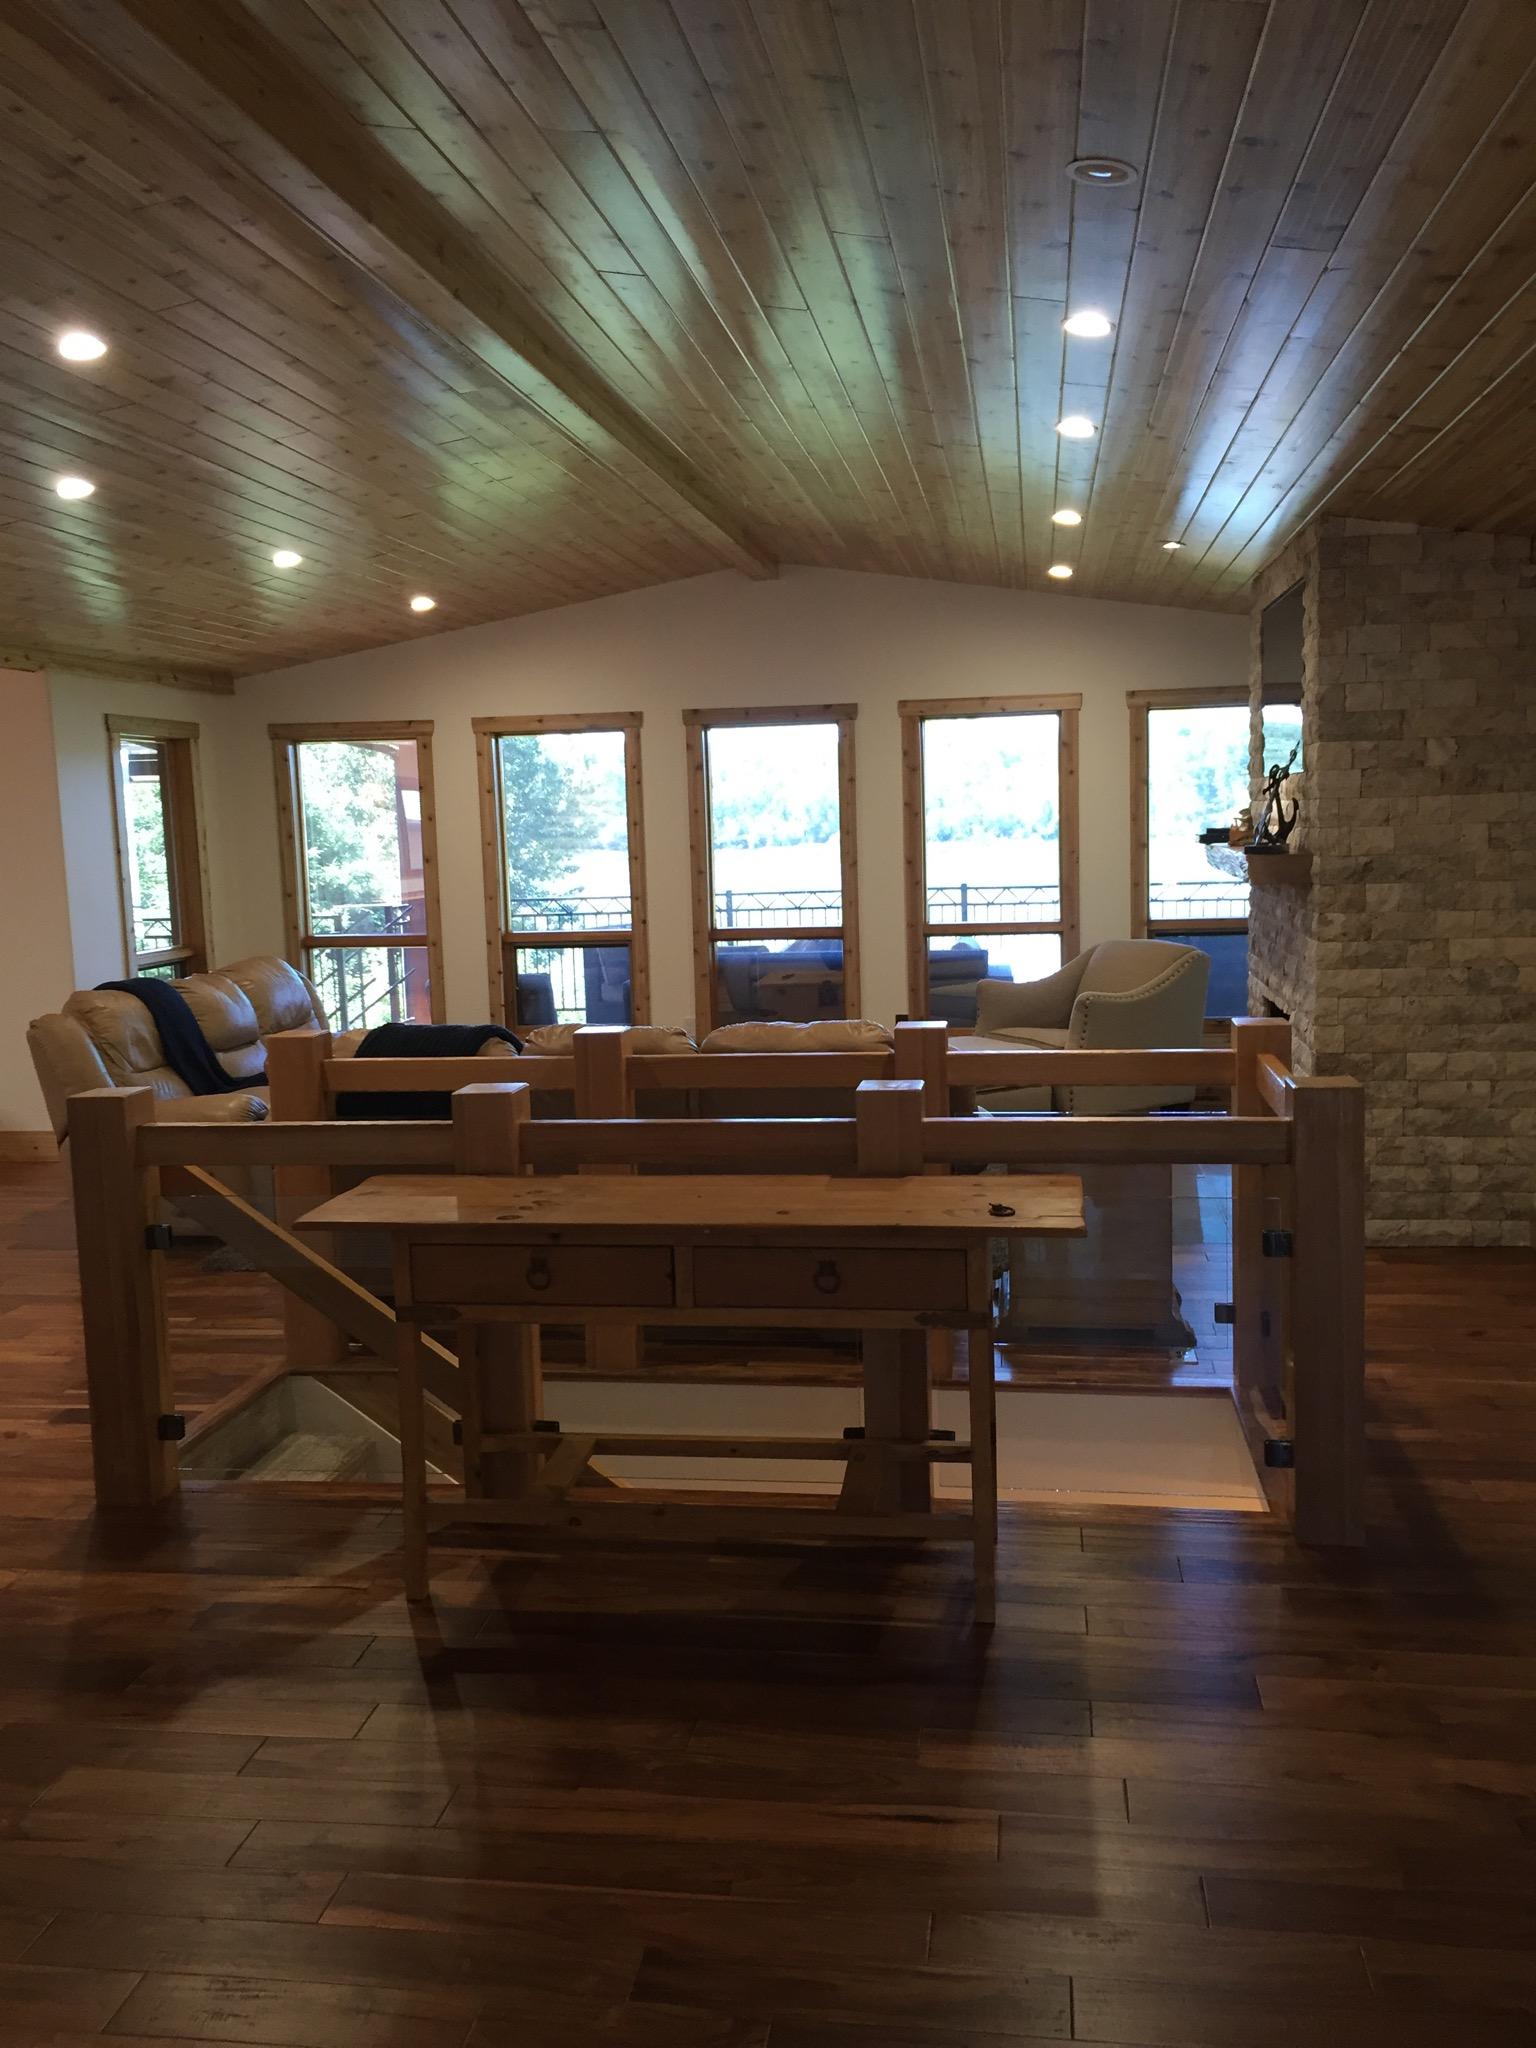 Open concept stair surround cedar posts and glass,cedar ceiling.